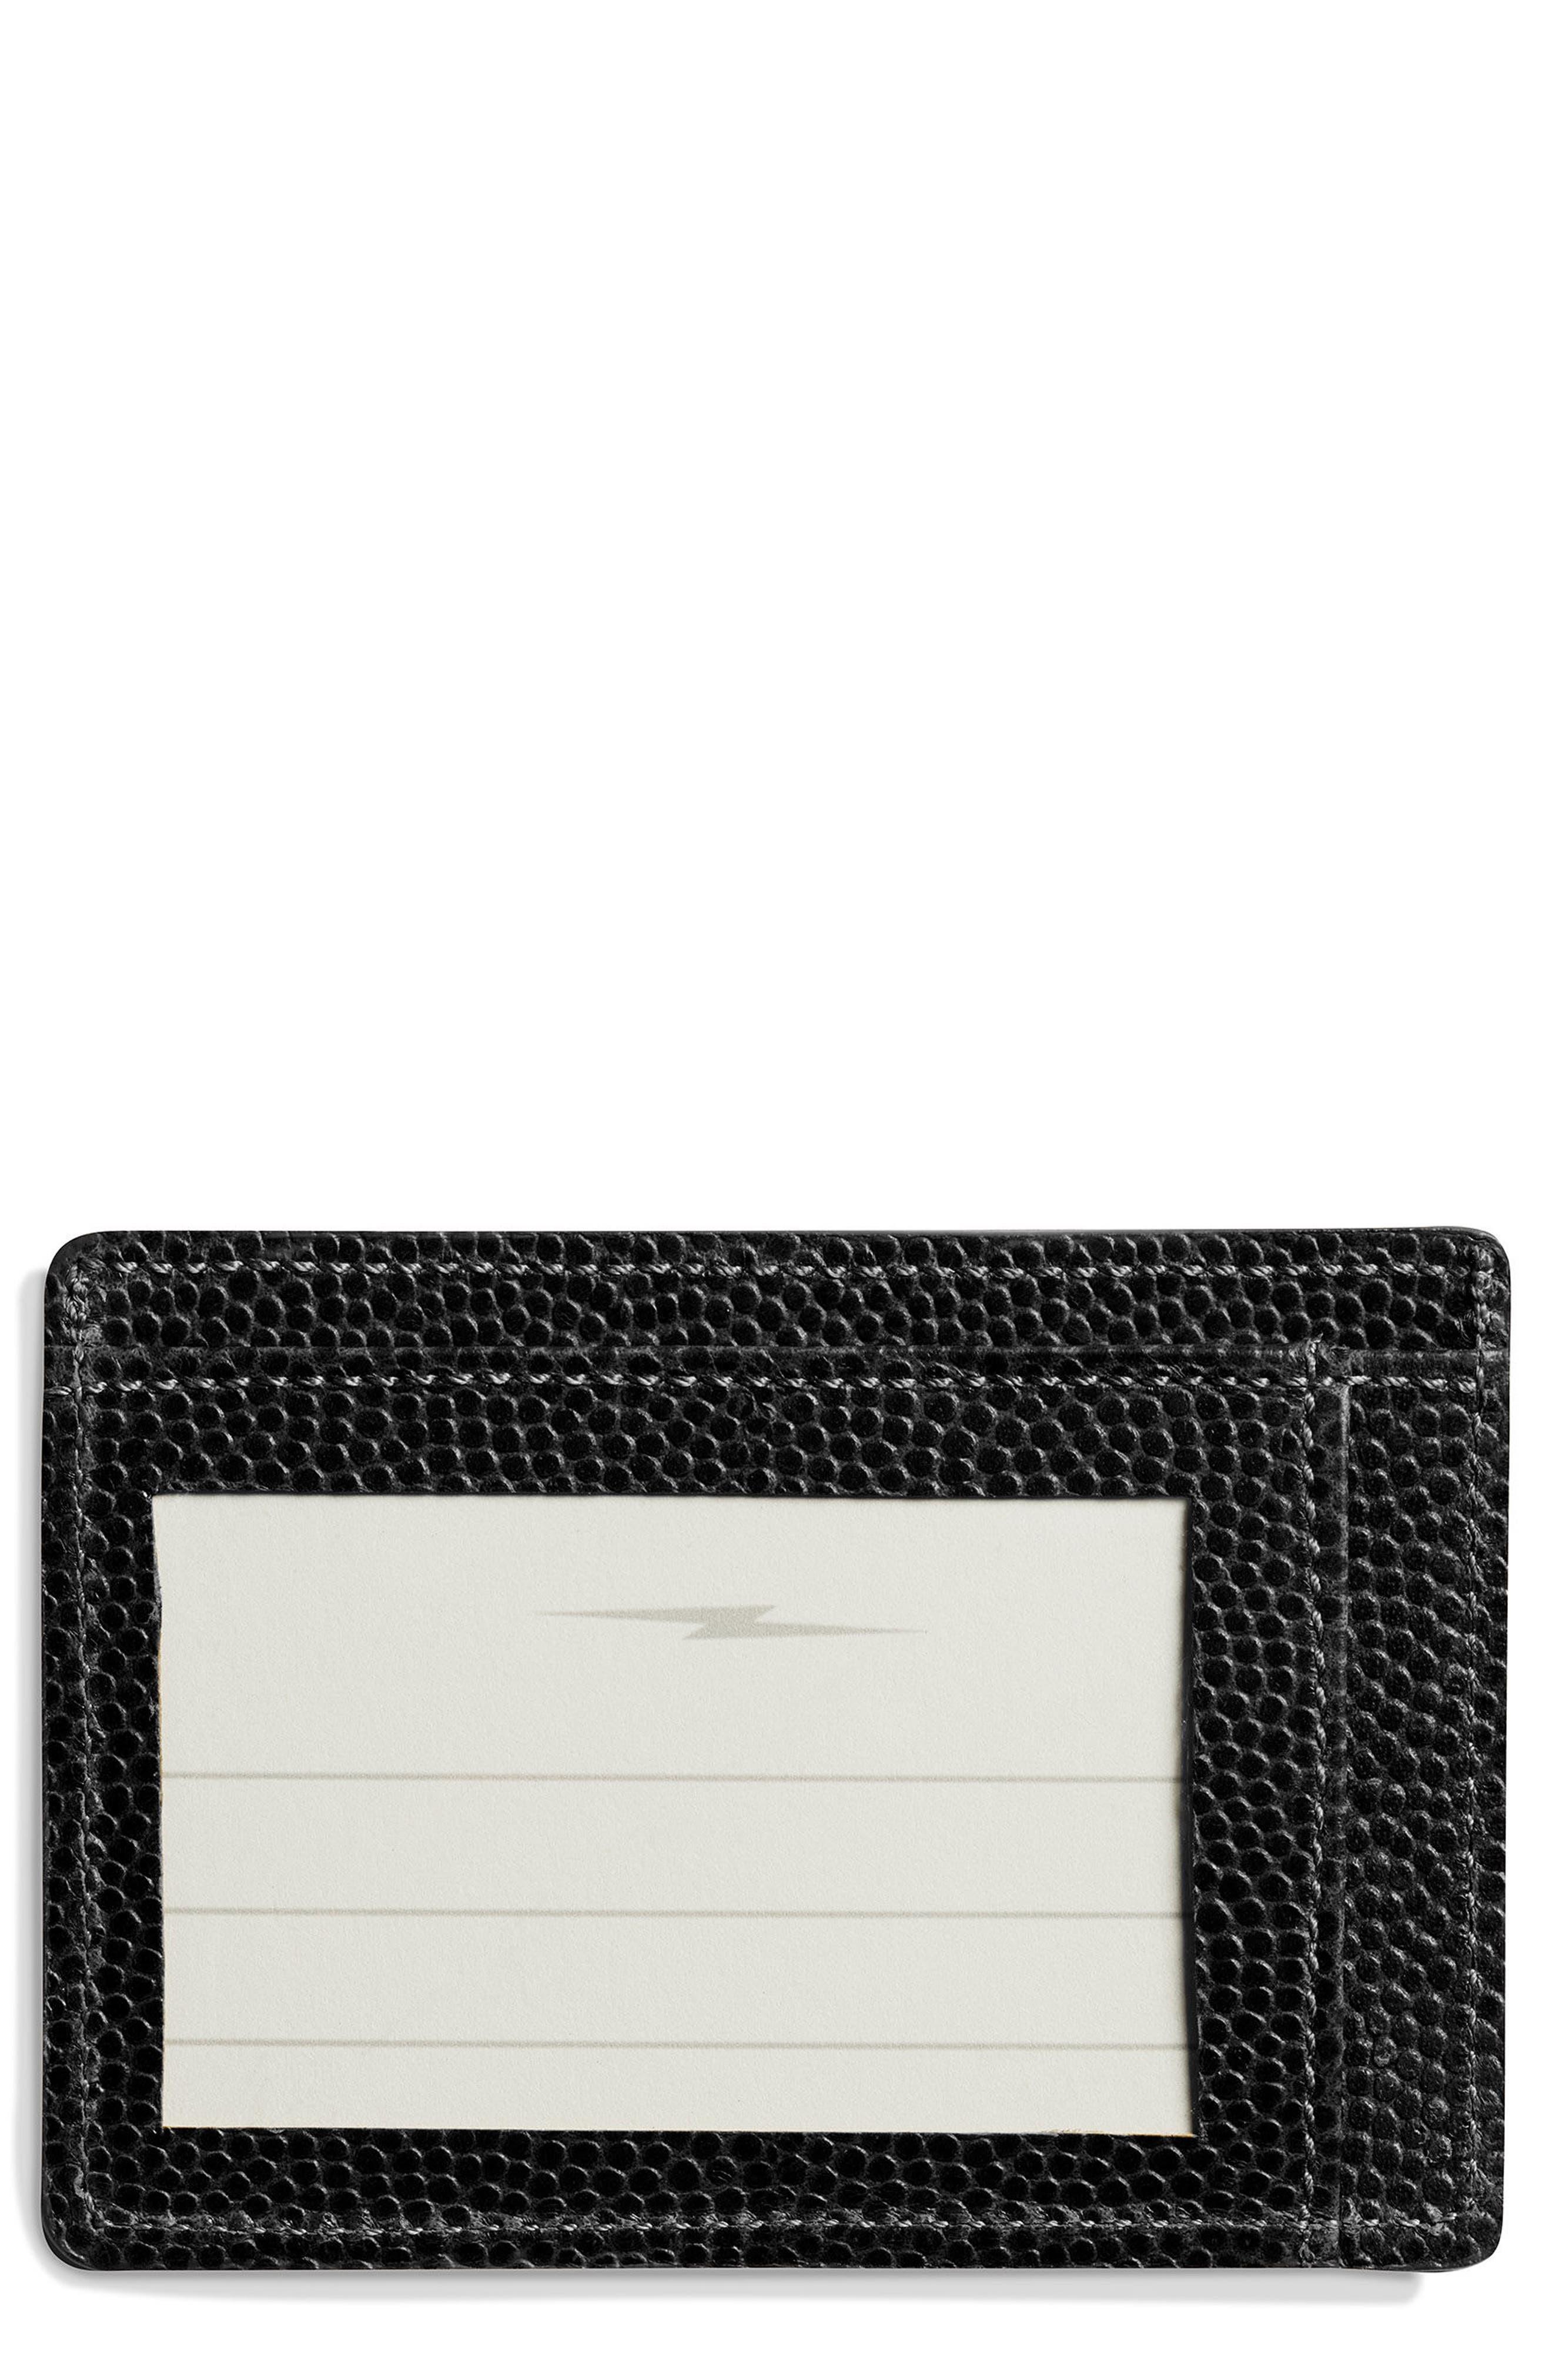 Latigo Leather Card Case,                             Main thumbnail 1, color,